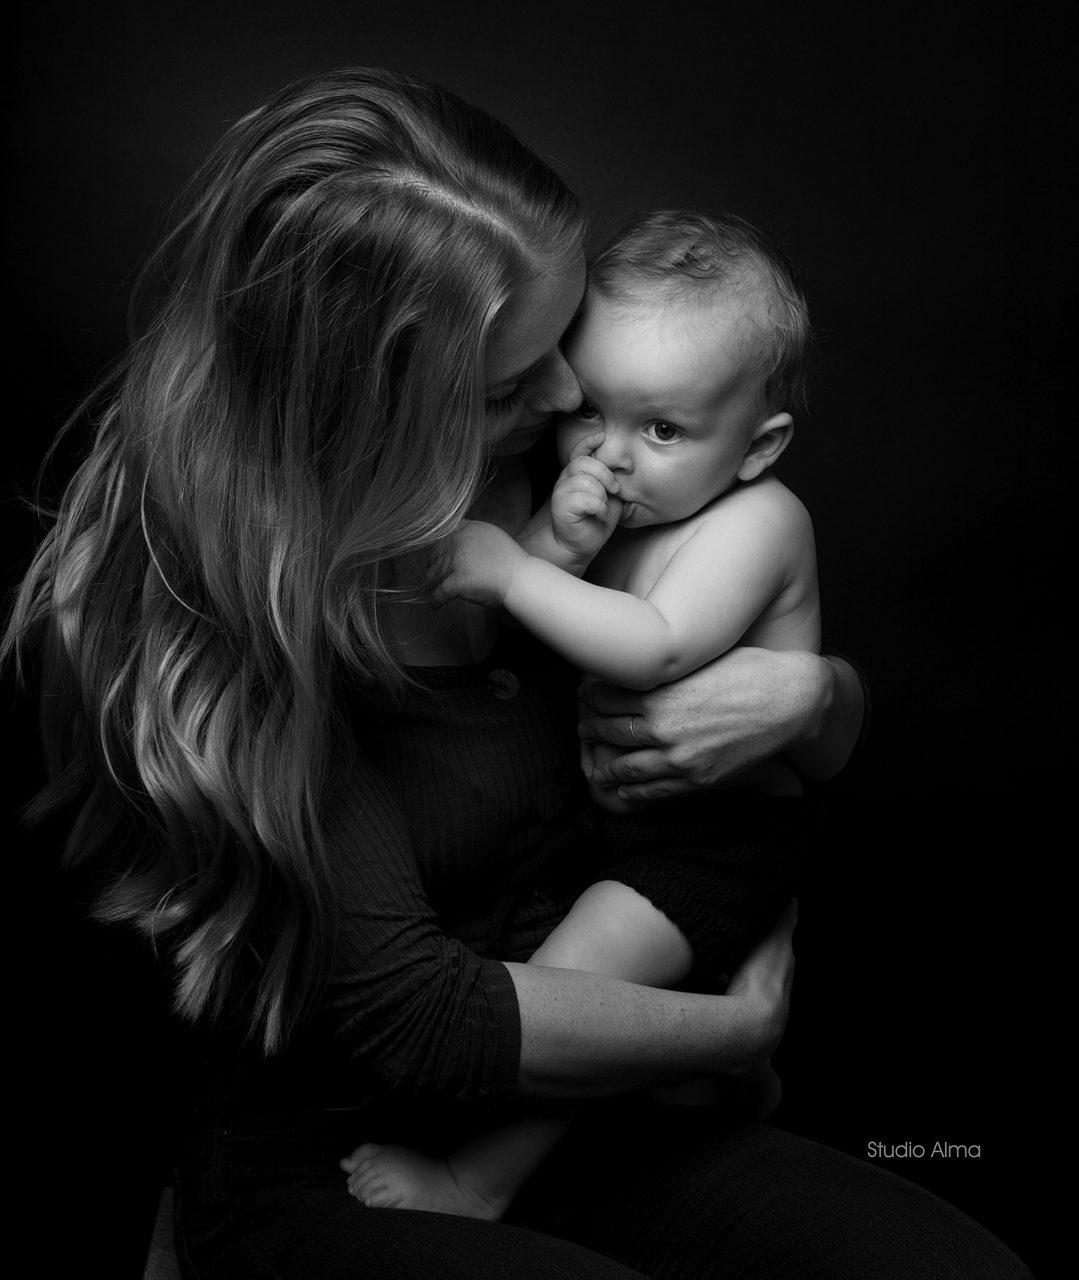 morbarn-barnebilde-fotograf-studioalma